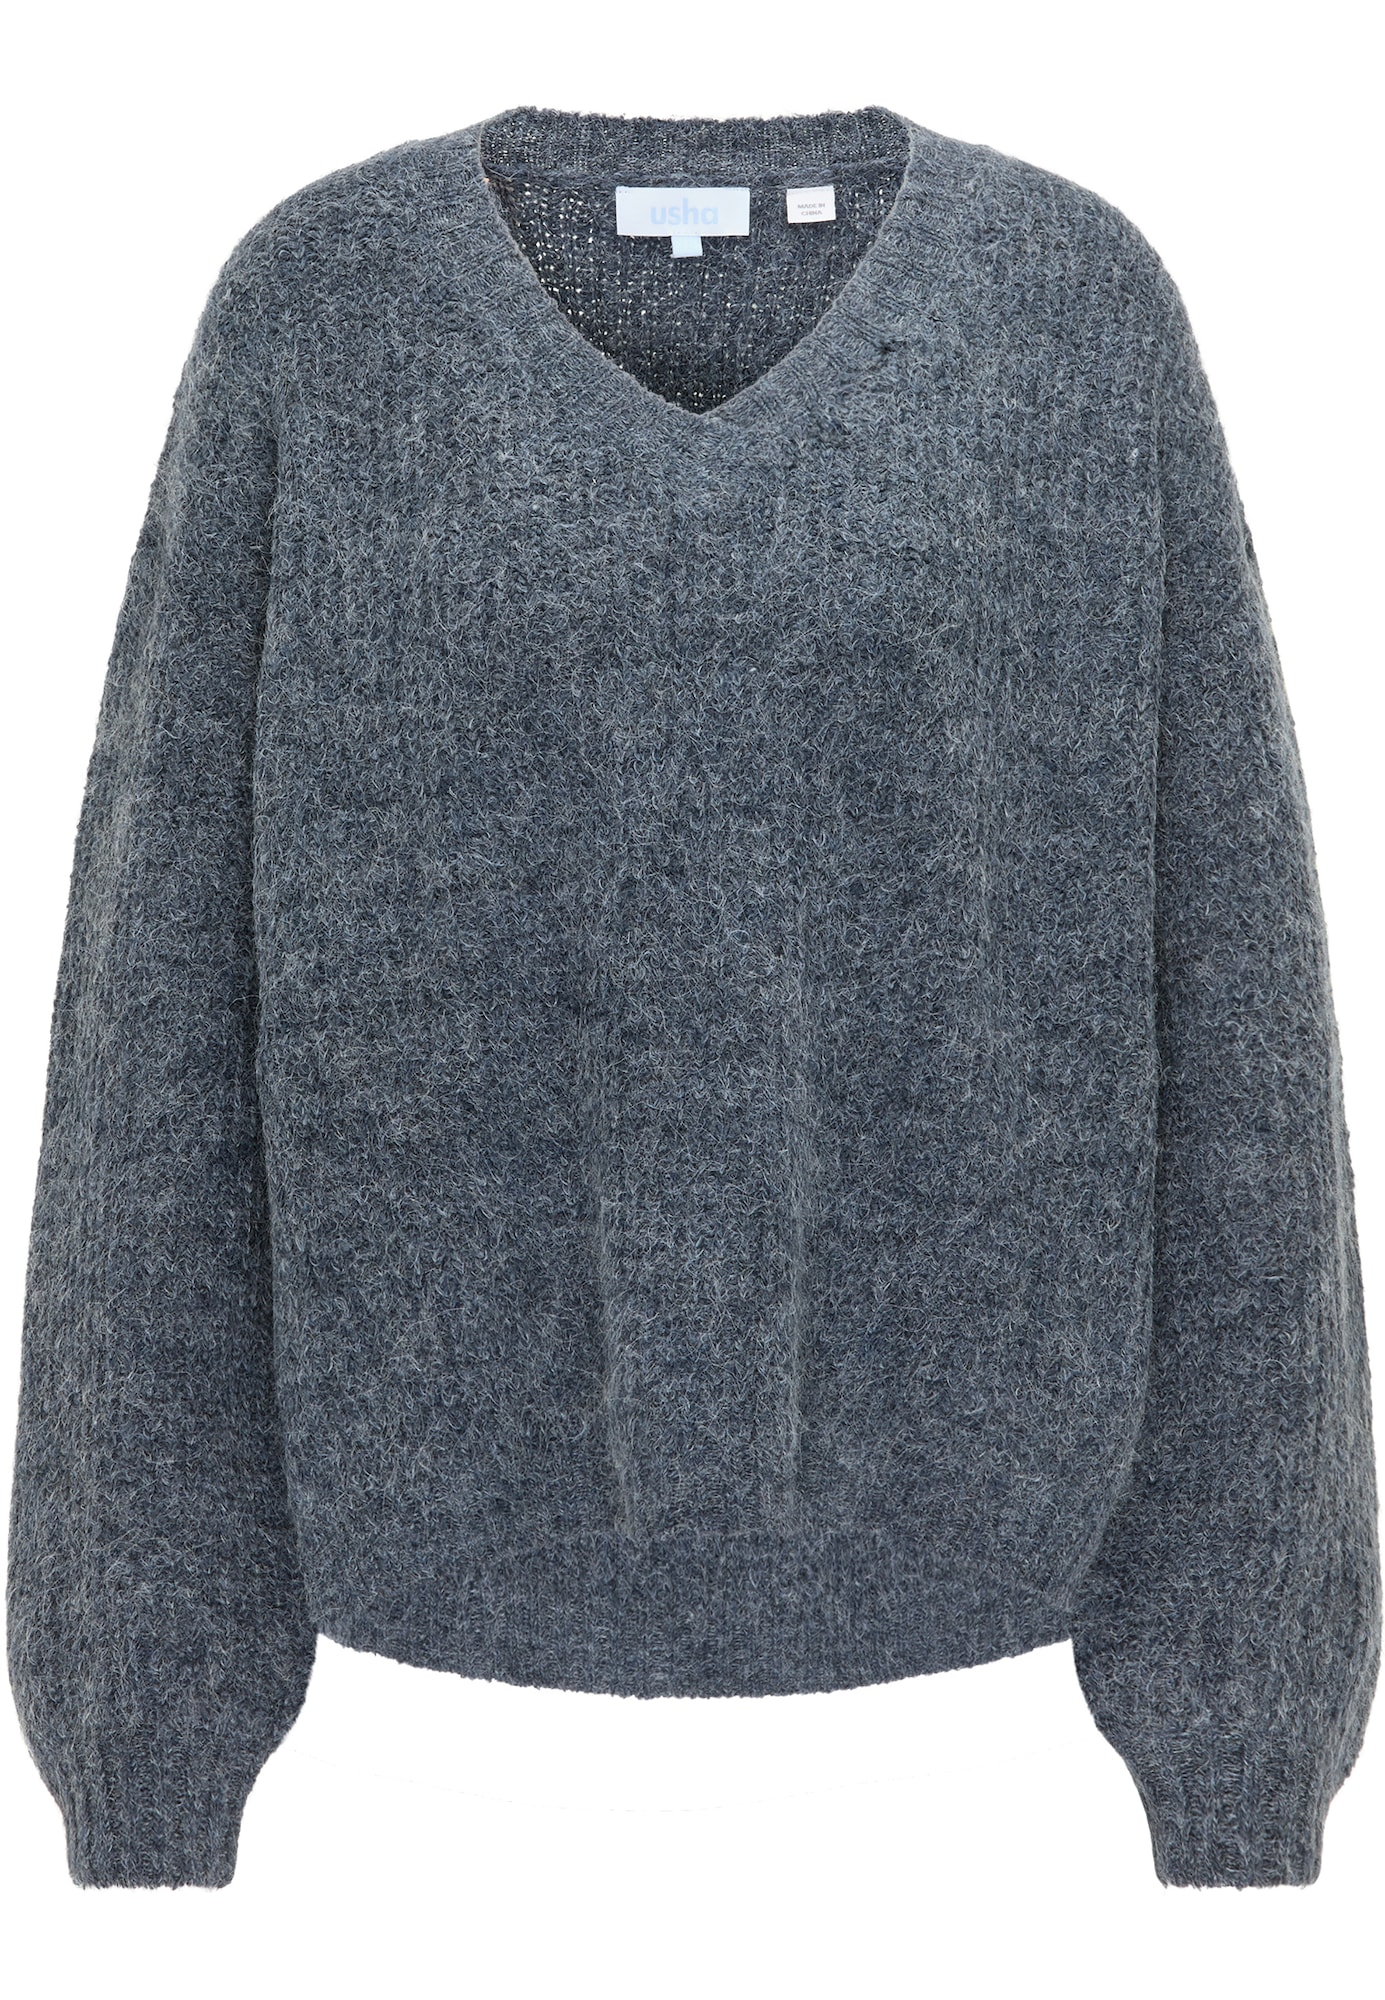 usha BLUE LABEL Laisvas megztinis mėlyna dūmų spalva